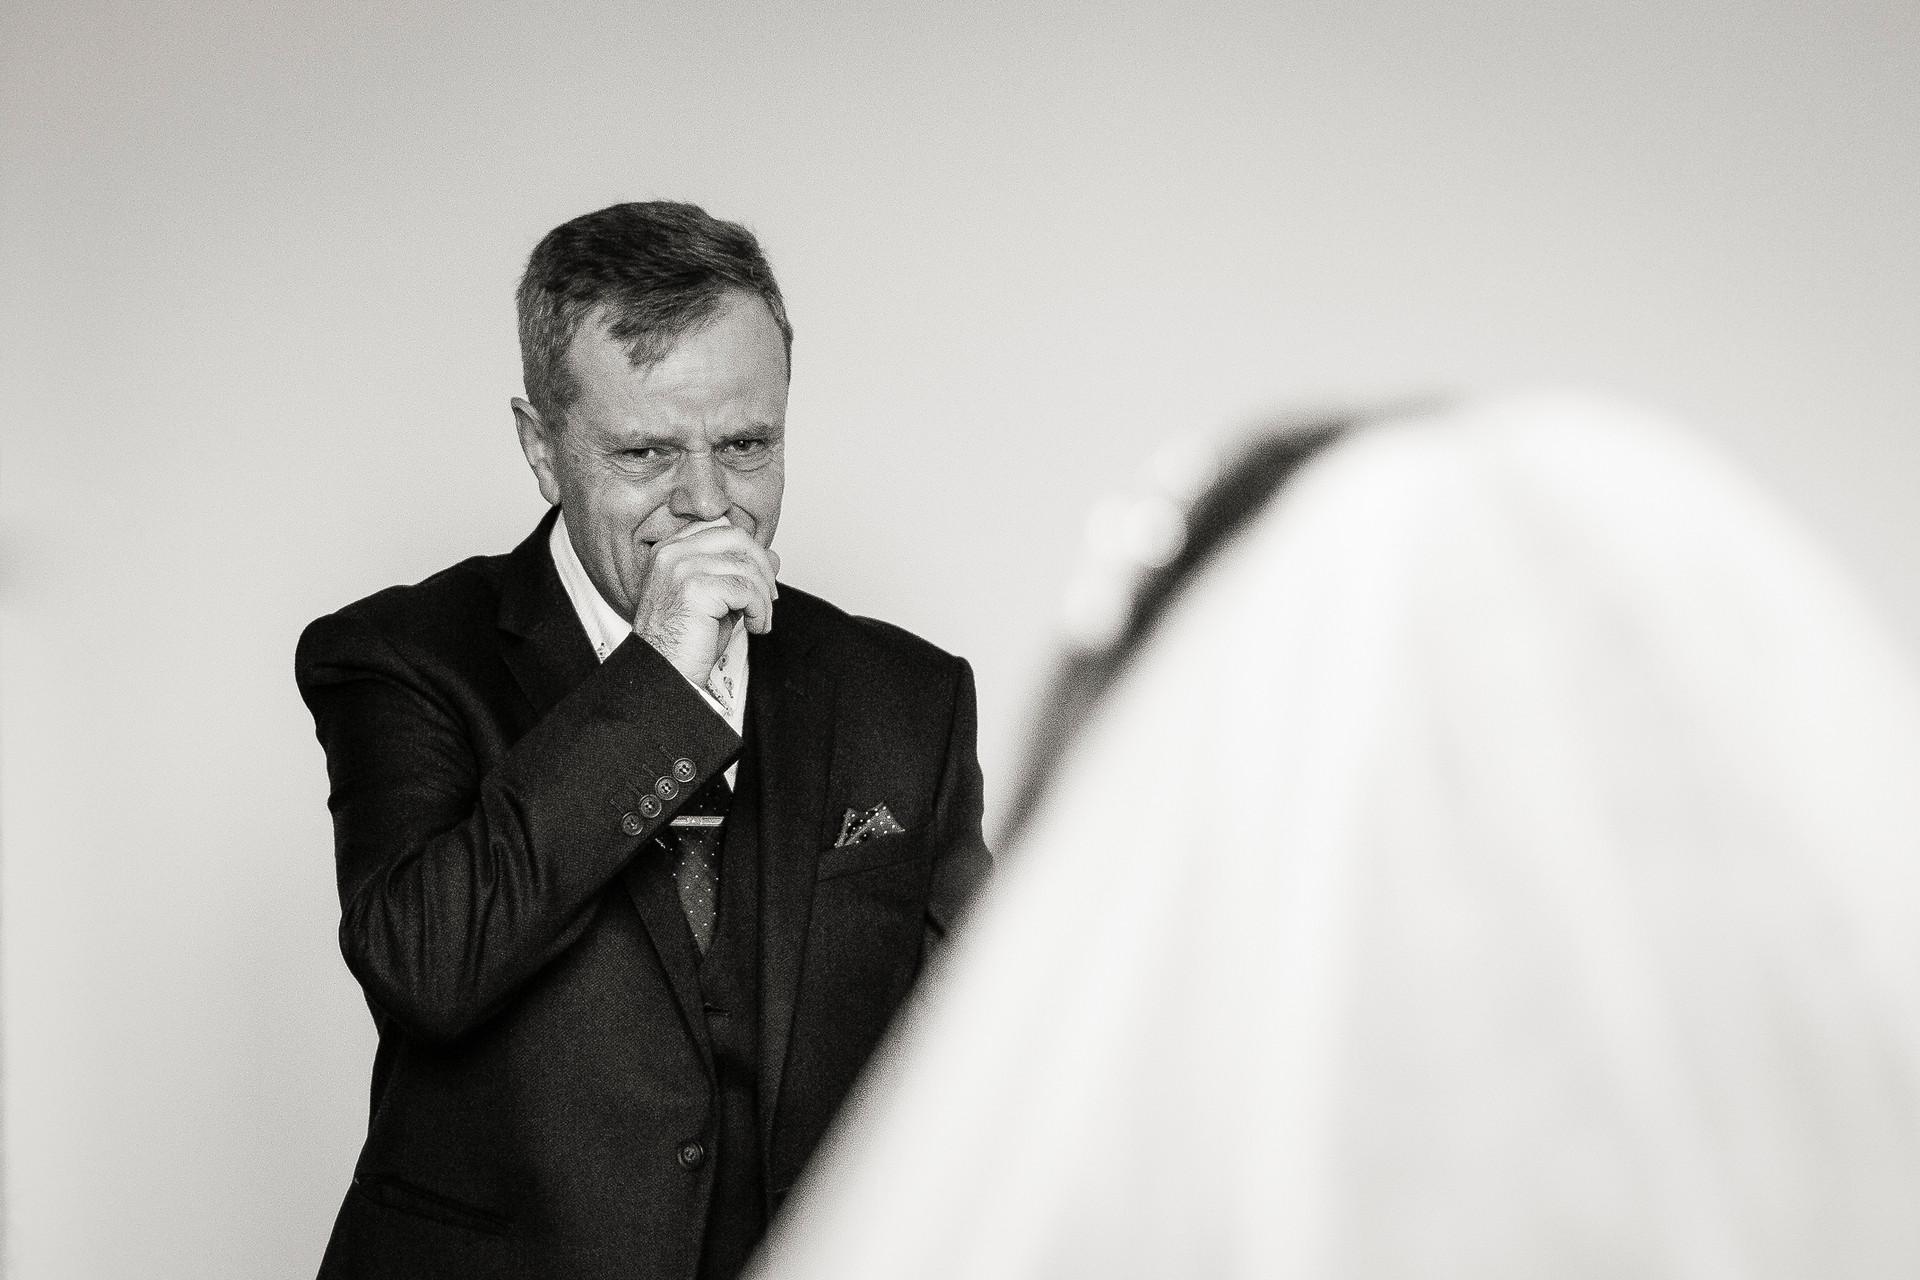 Christian wedding photographer in Yorkshire